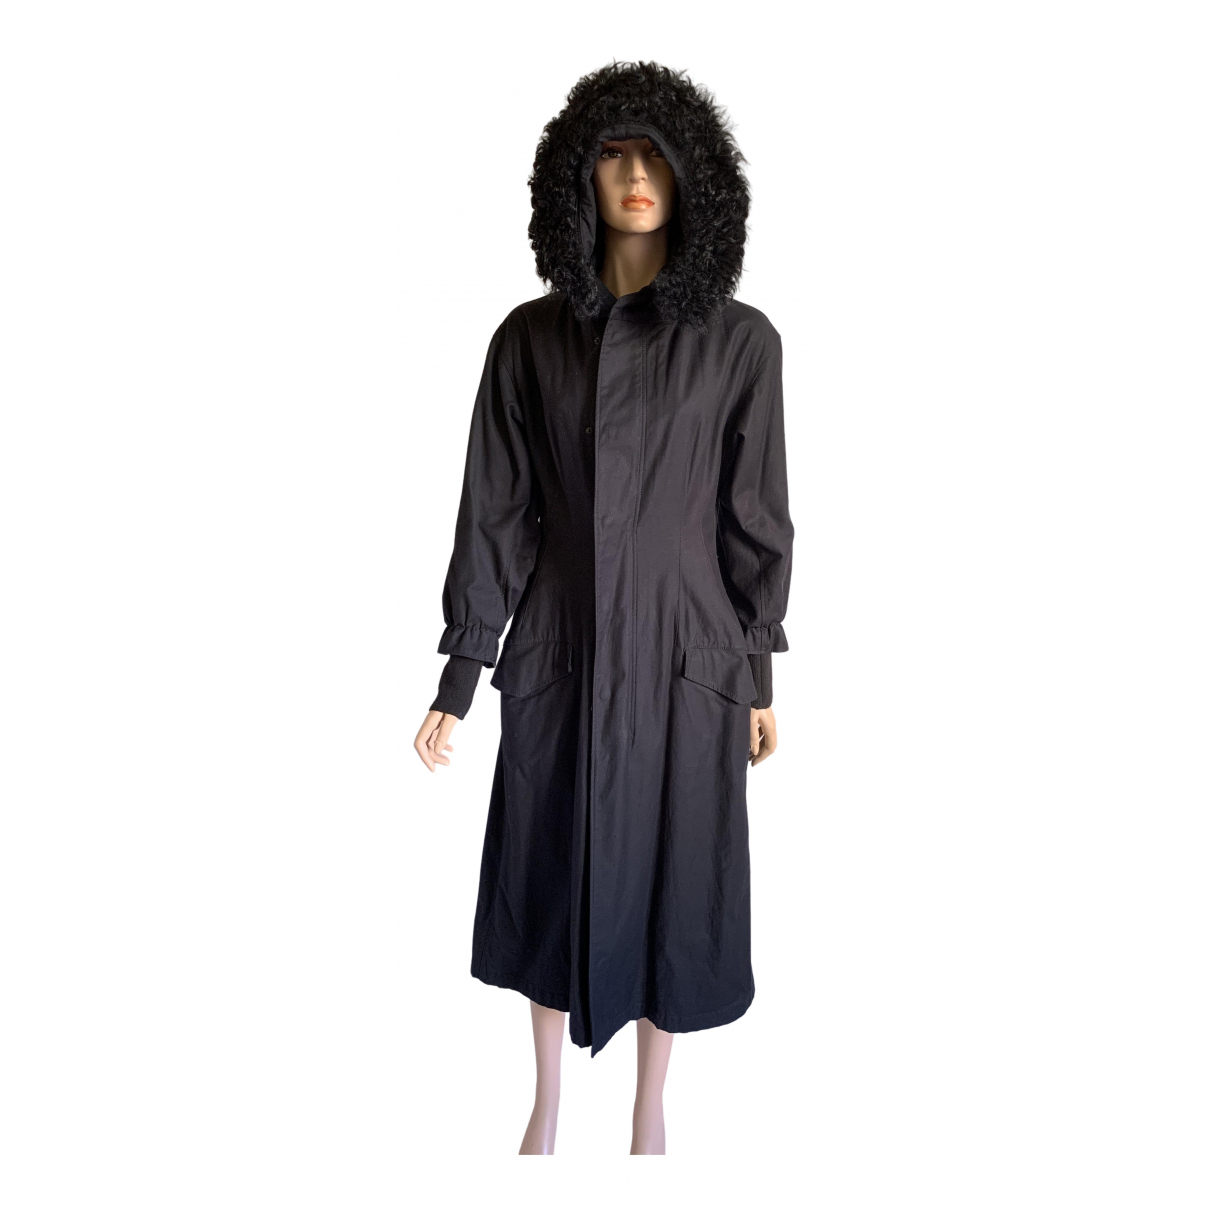 Y-3 By Yohji Yamamoto N Black Cotton coat for Women S International